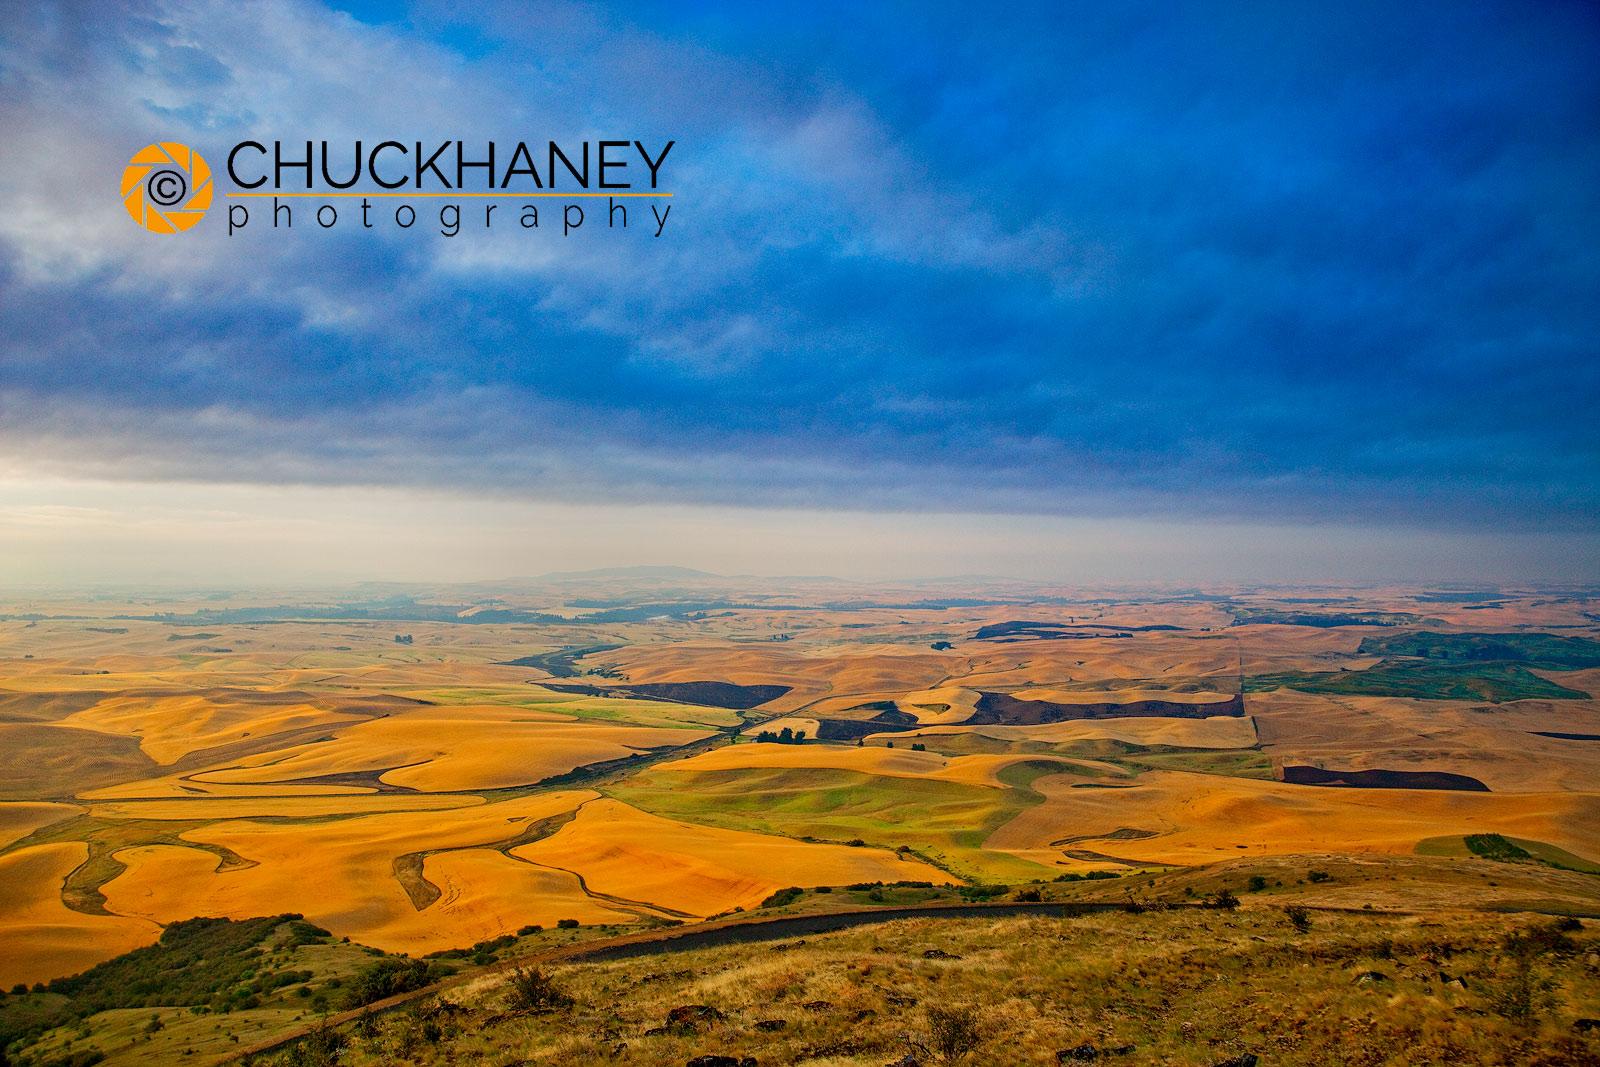 Crop duster - Chuck Haney Photo